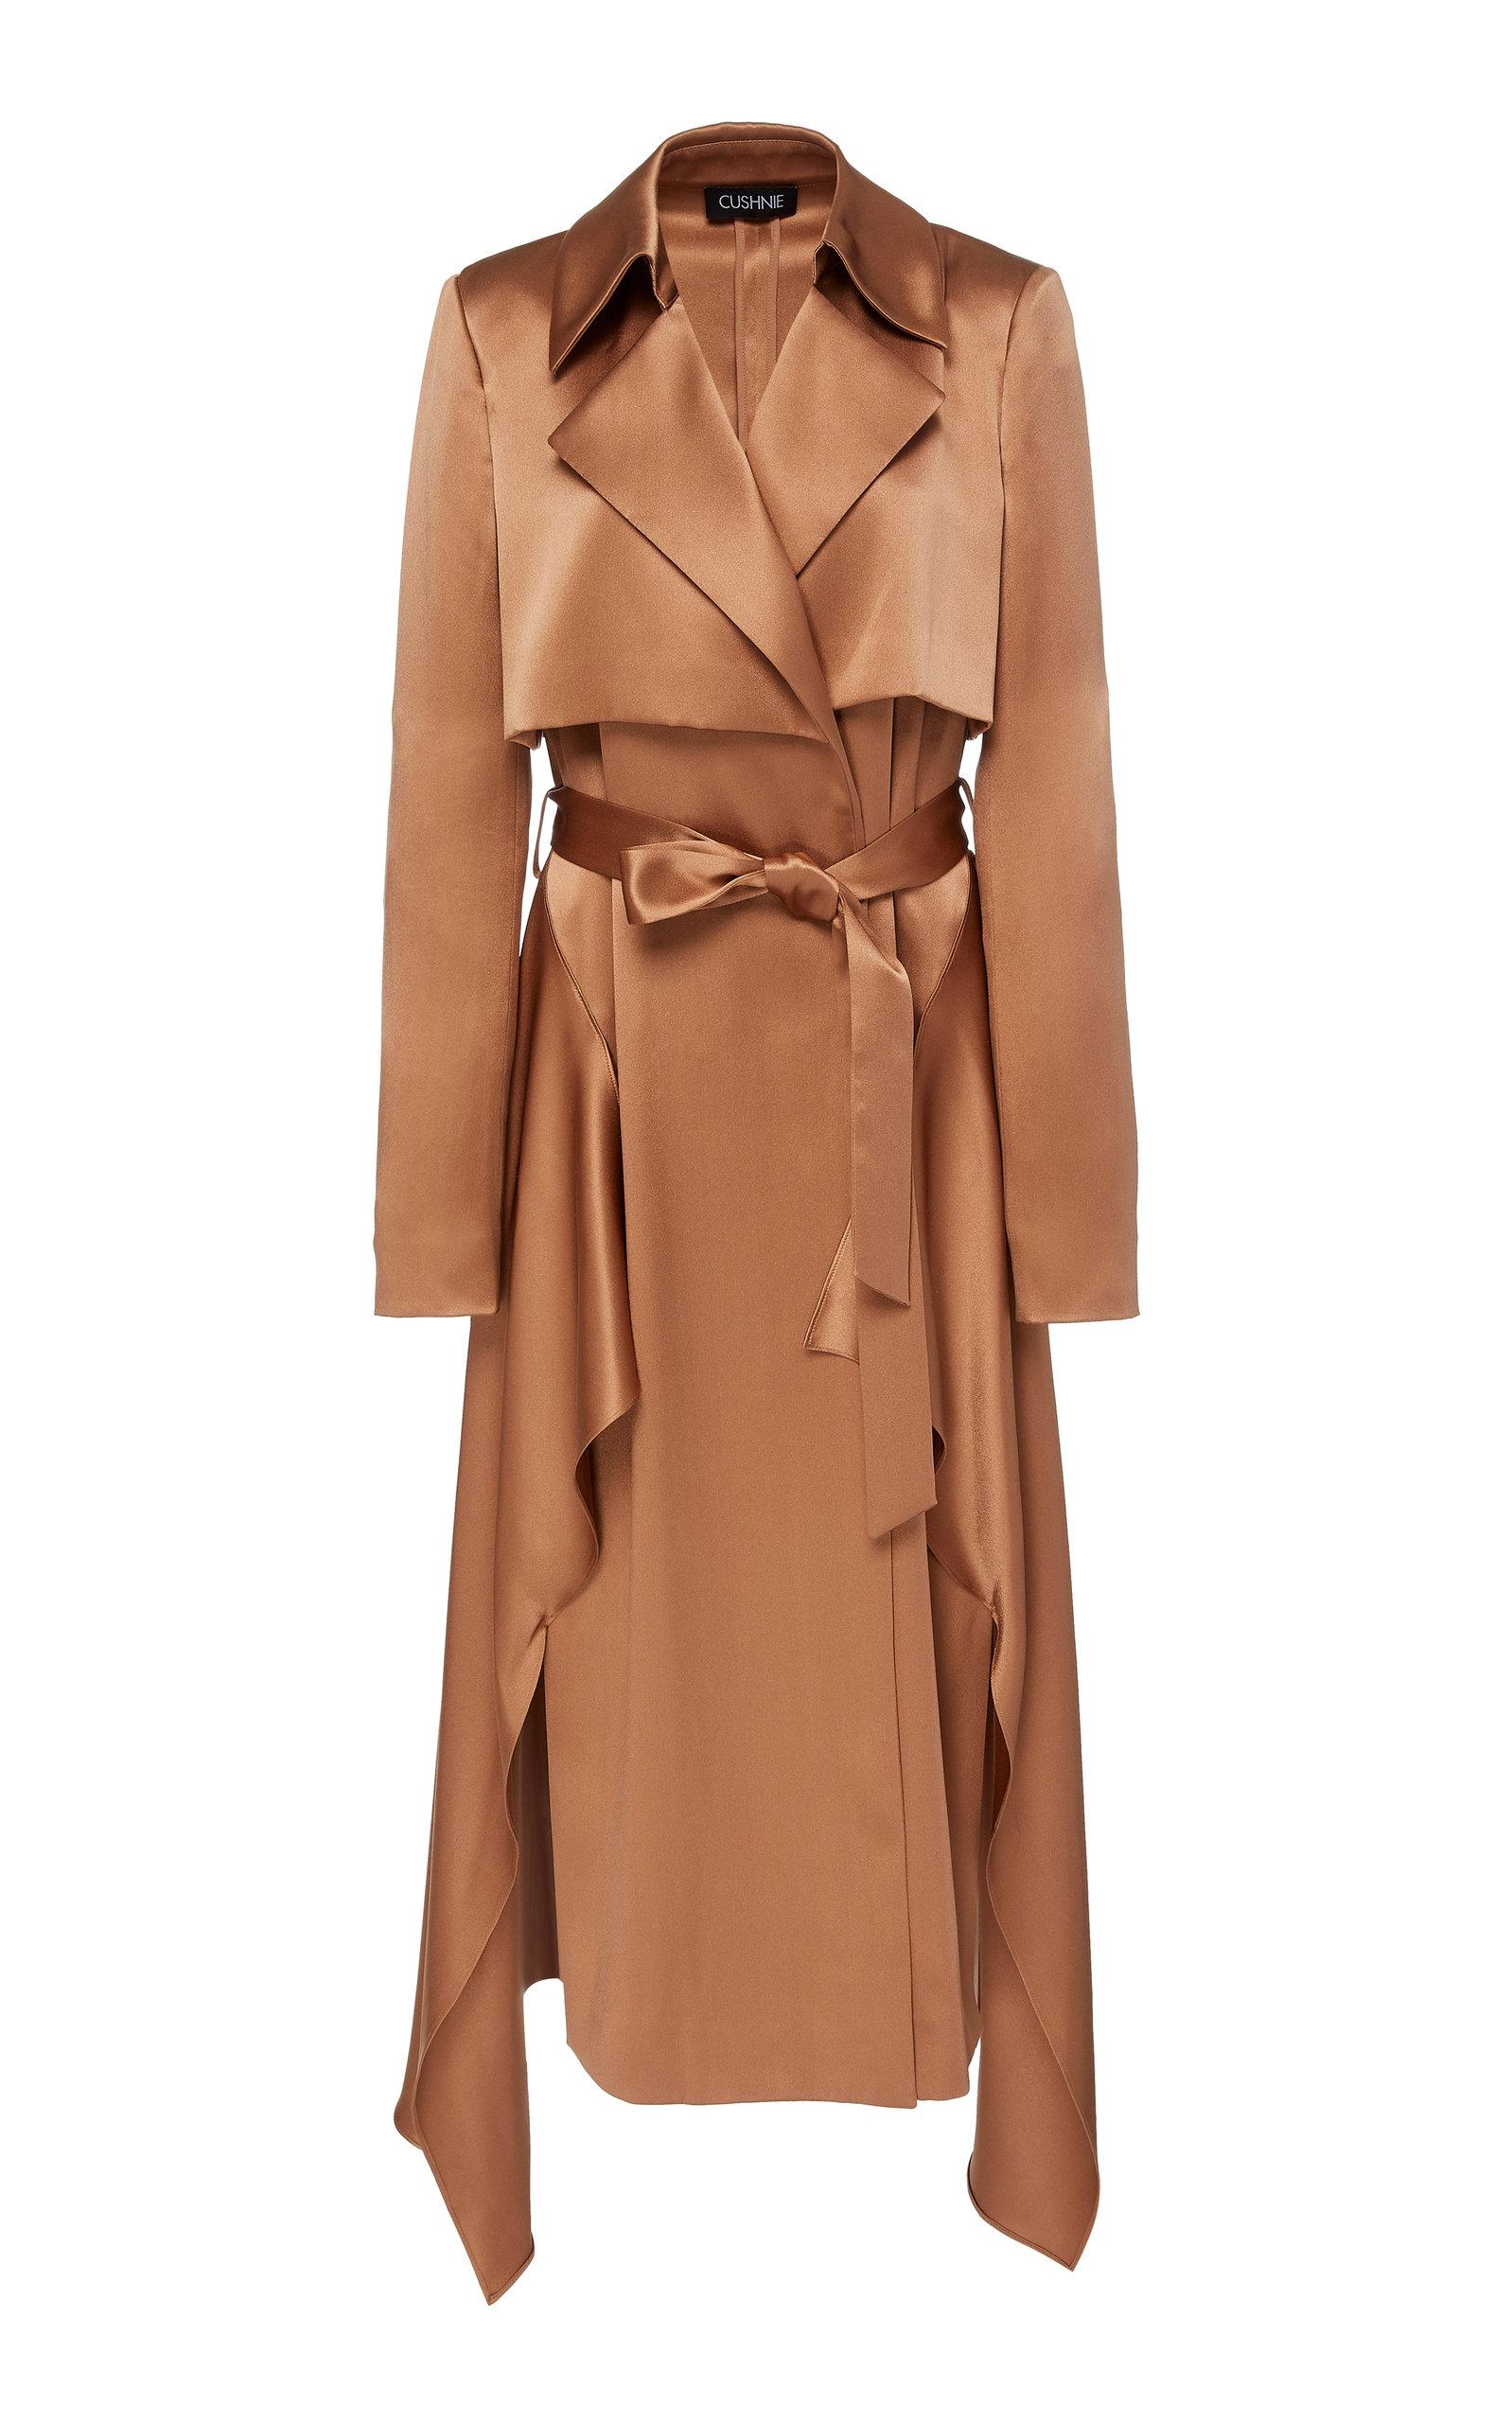 e02212707f4 Satin-effect Silk Trench Coat by Cushnie | Moda Operandi